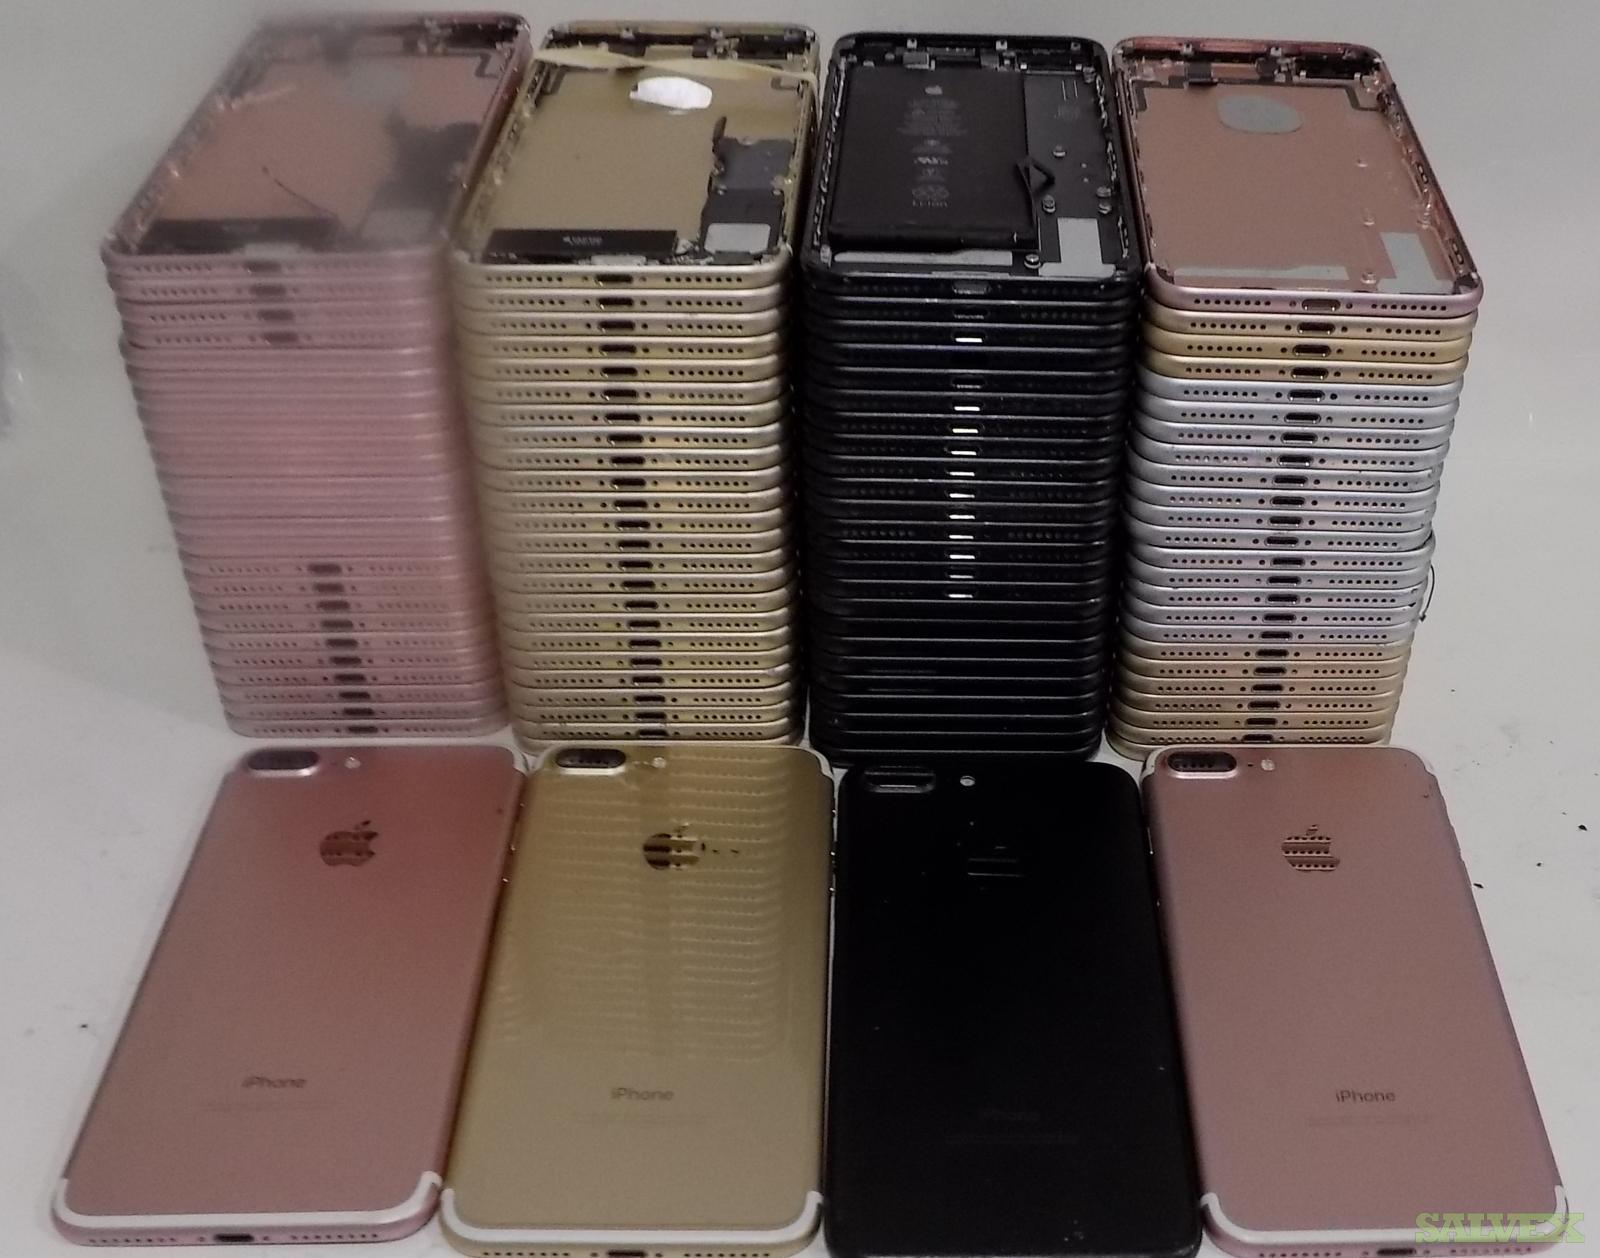 Apple iPhone 7 Plus Housing (100 units)